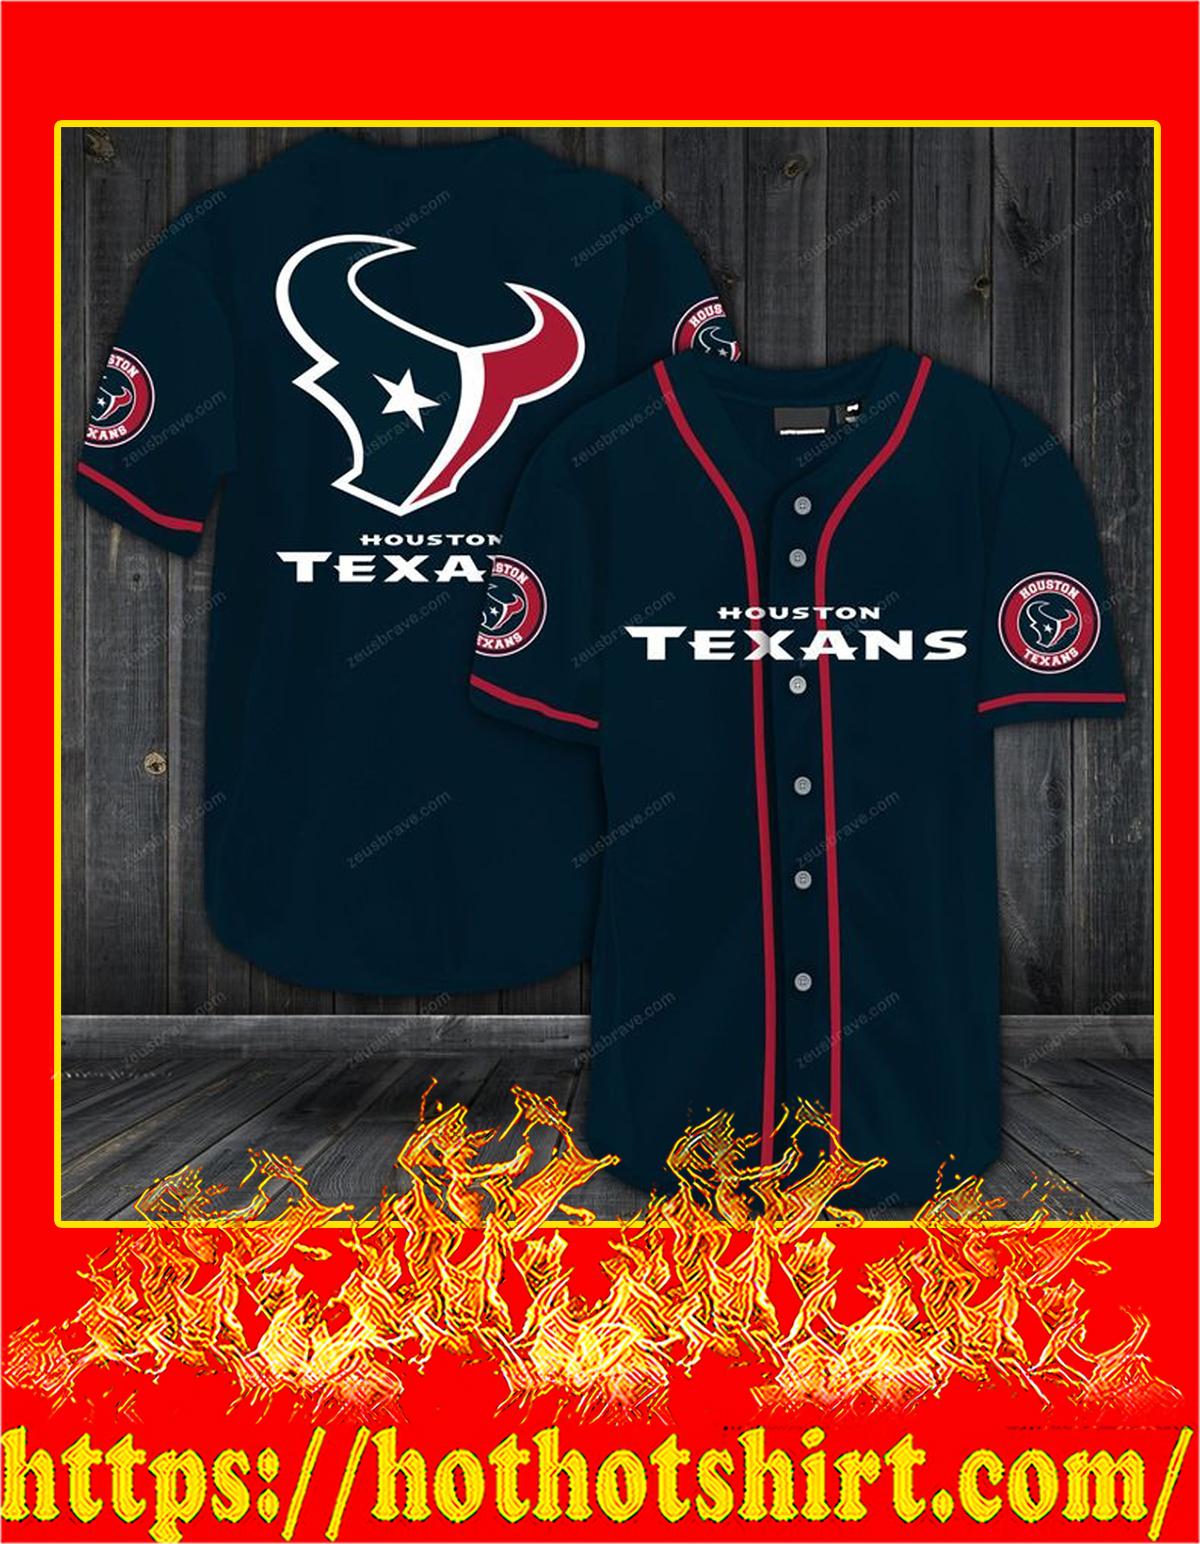 Houston texans hawaiian shirt - pic 2